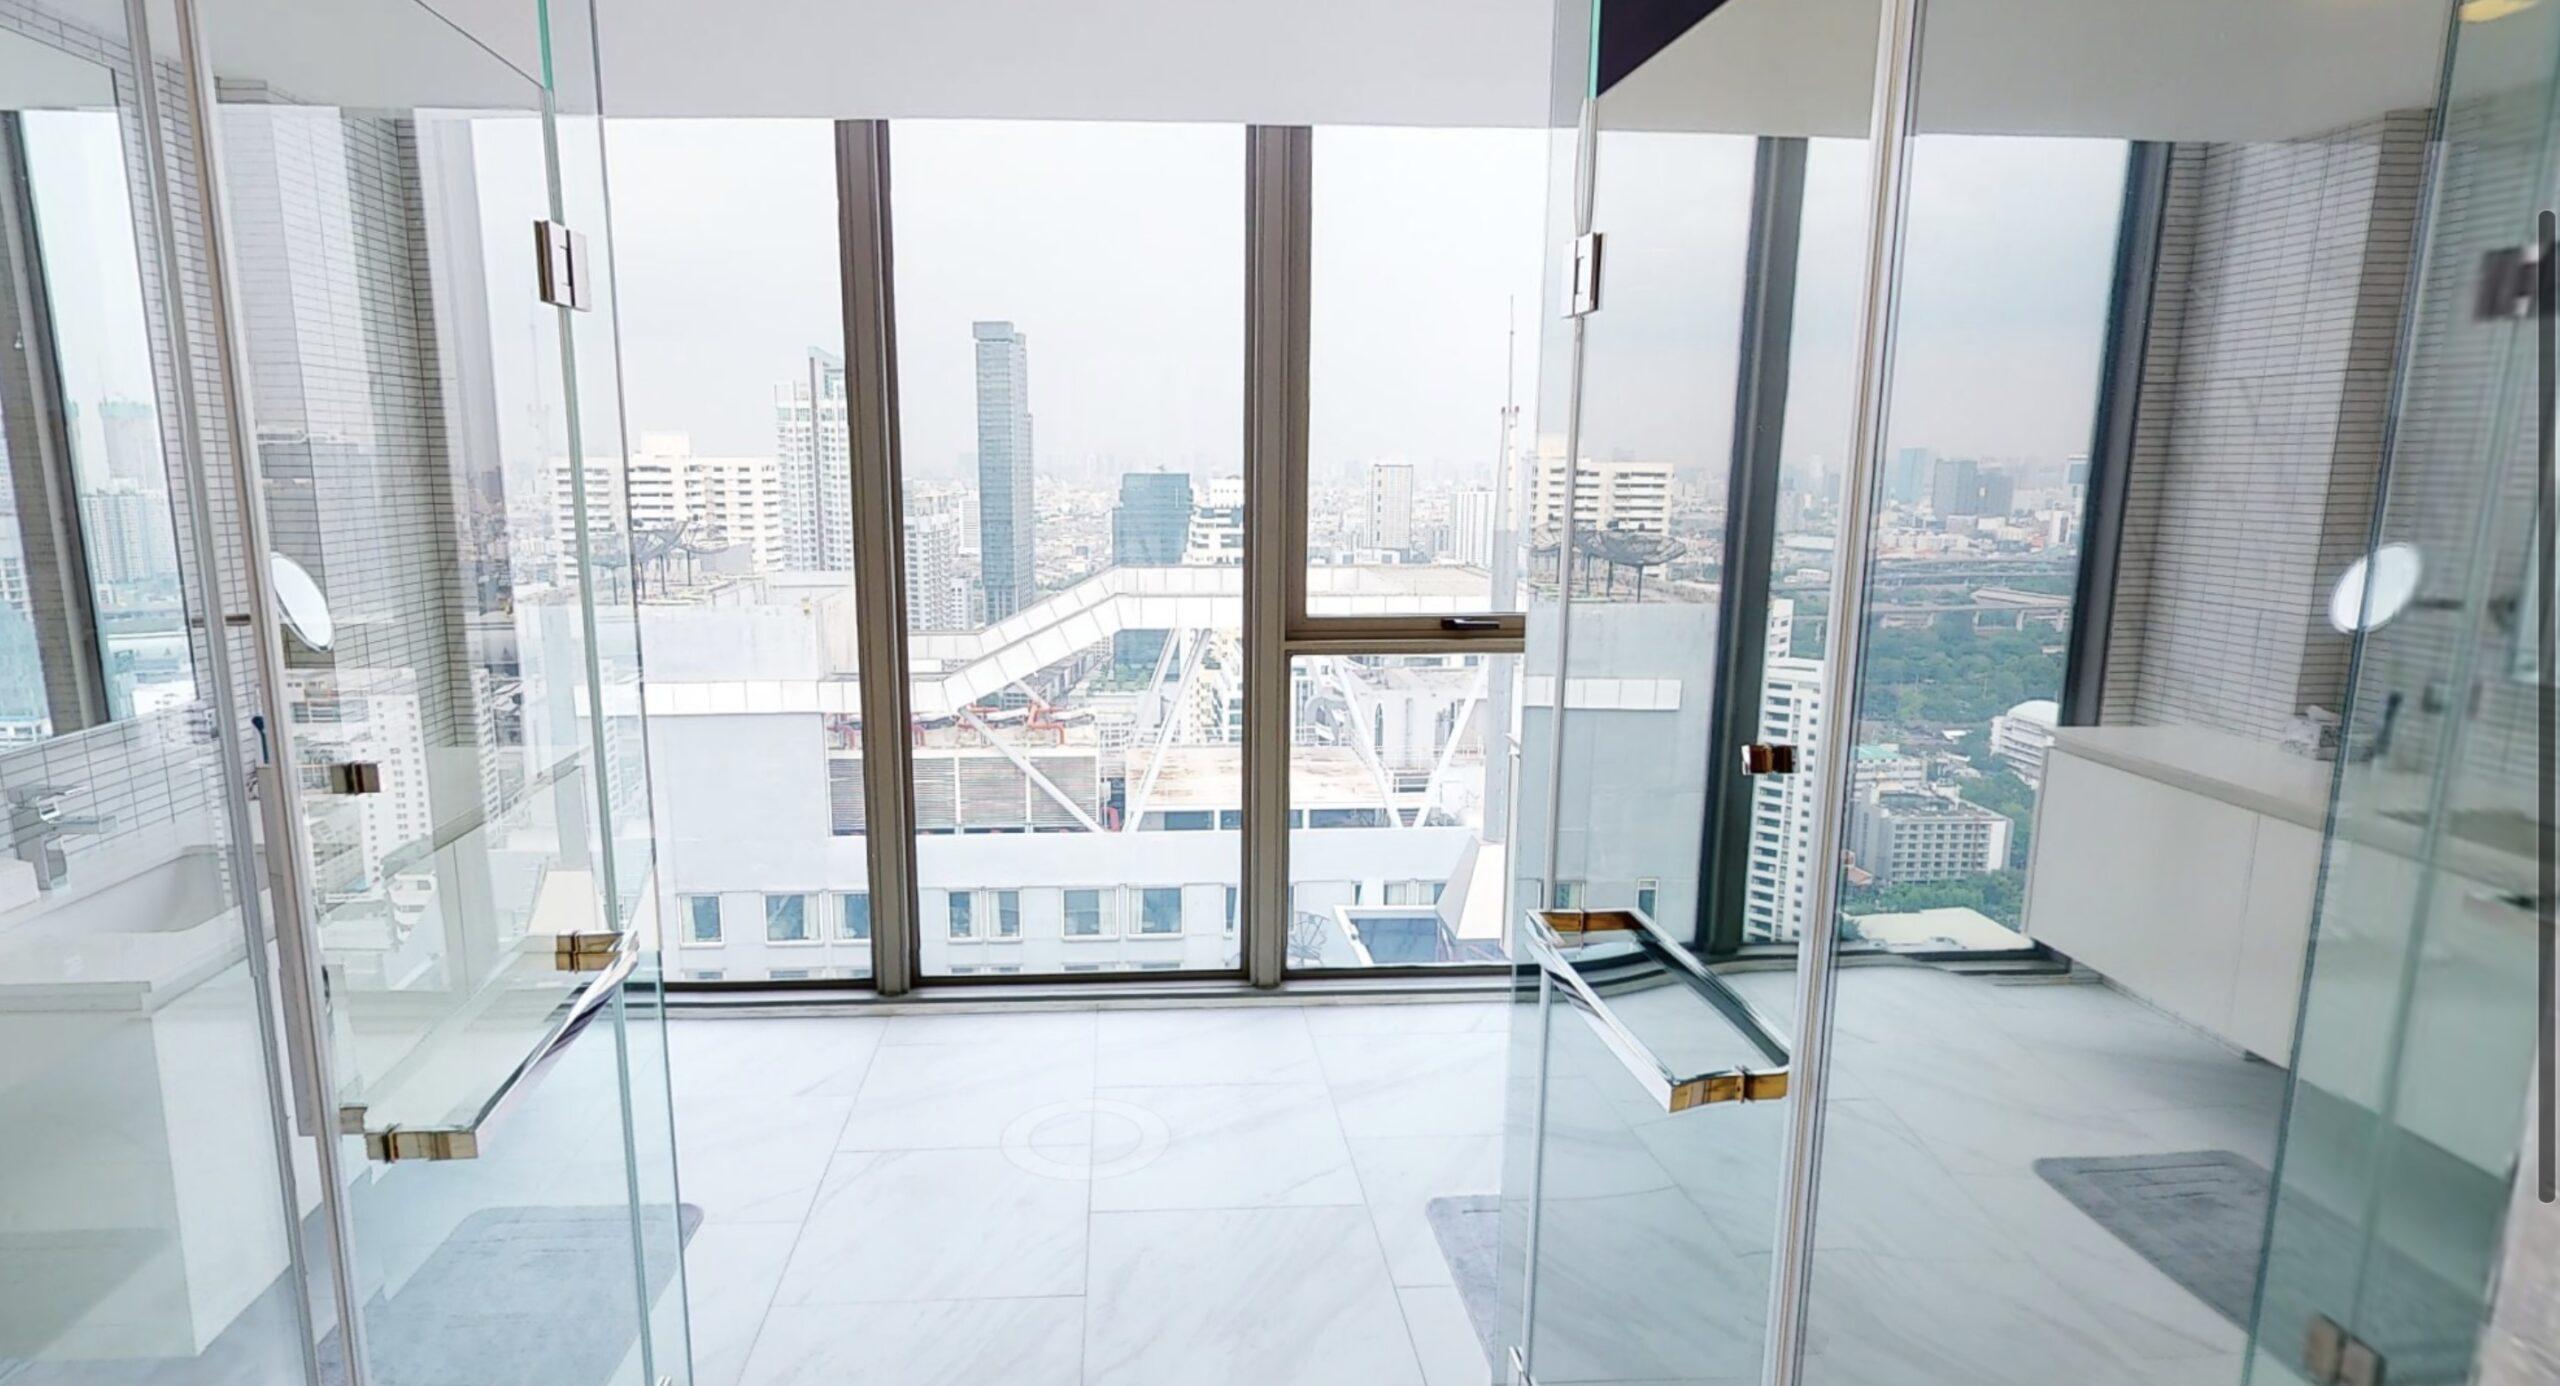 Bangkok Property Condo Apartment Real Estate For Sale in Nana Sukhumvit Stunning Duplex in Nana